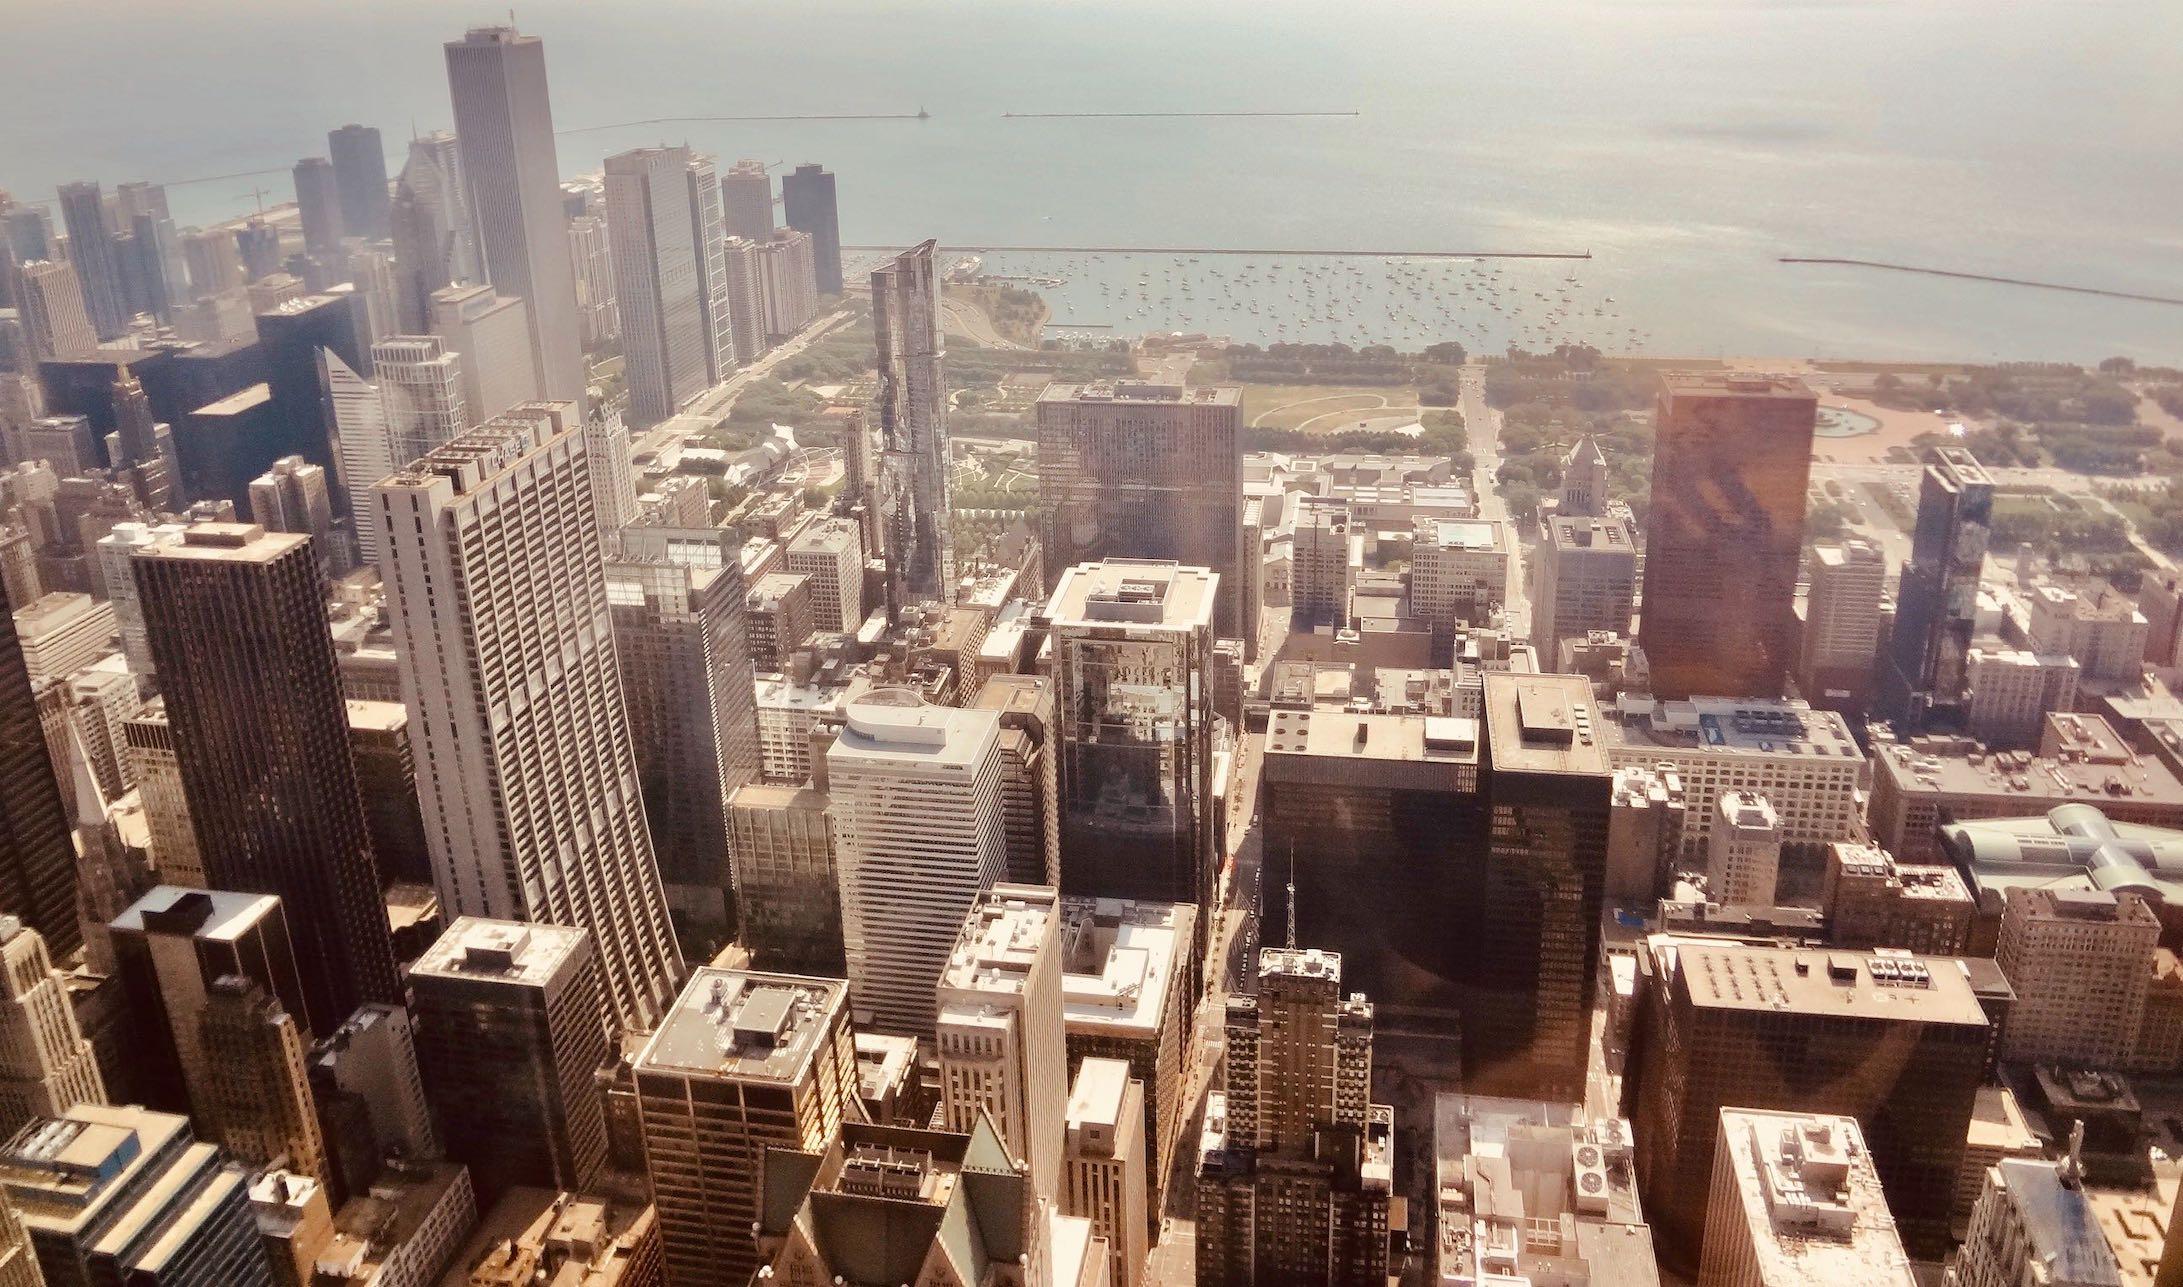 Chicago Nostalgia views from Willis Tower